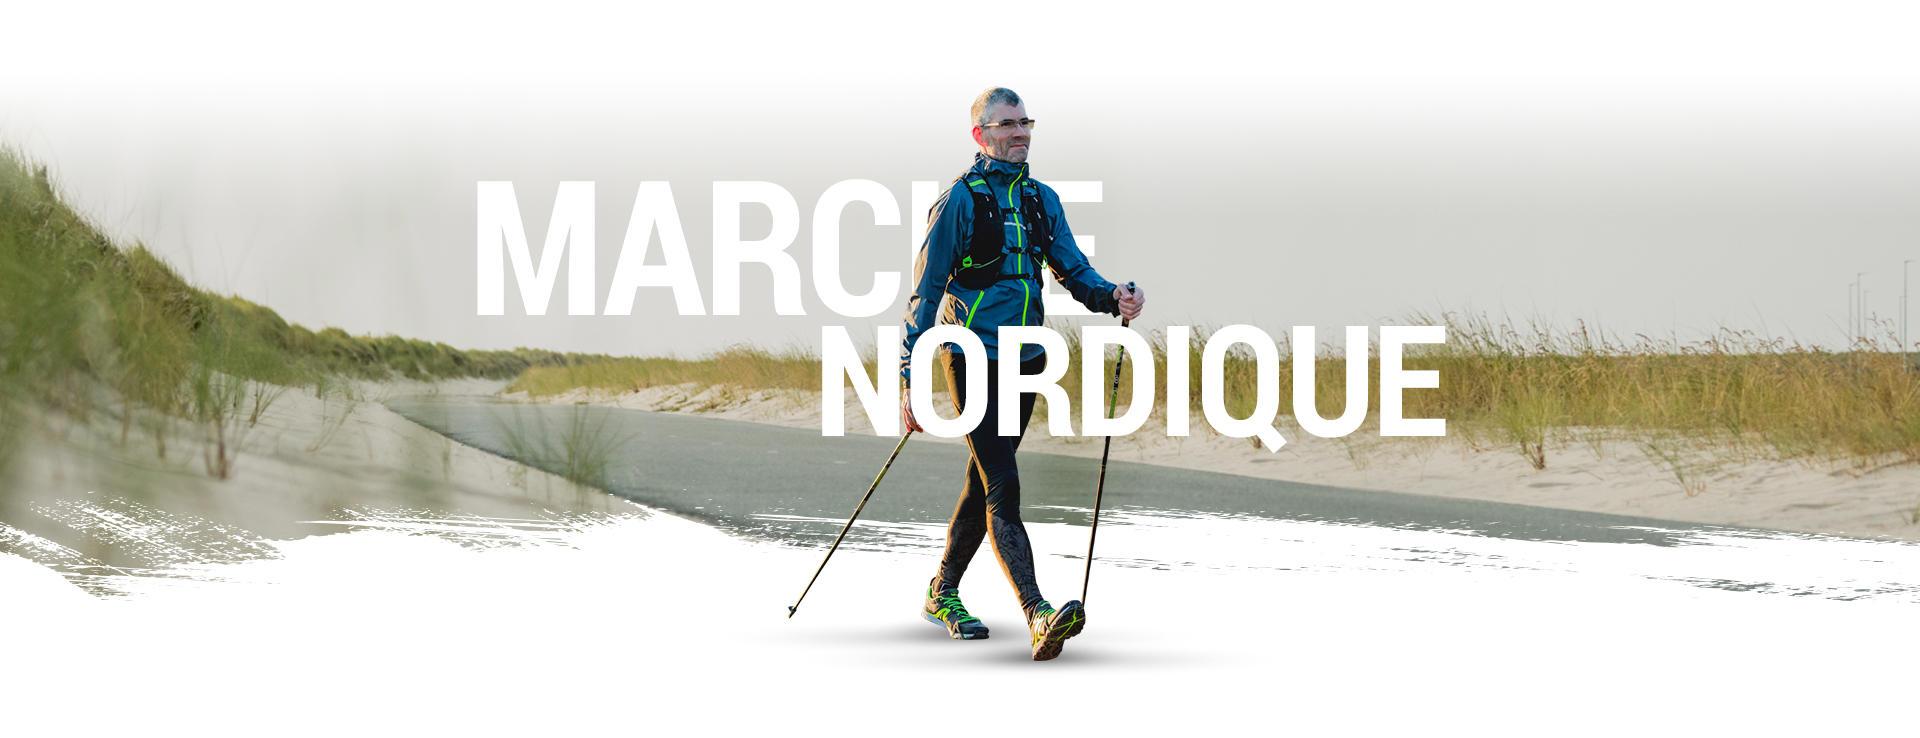 Newfeel Marche nordique